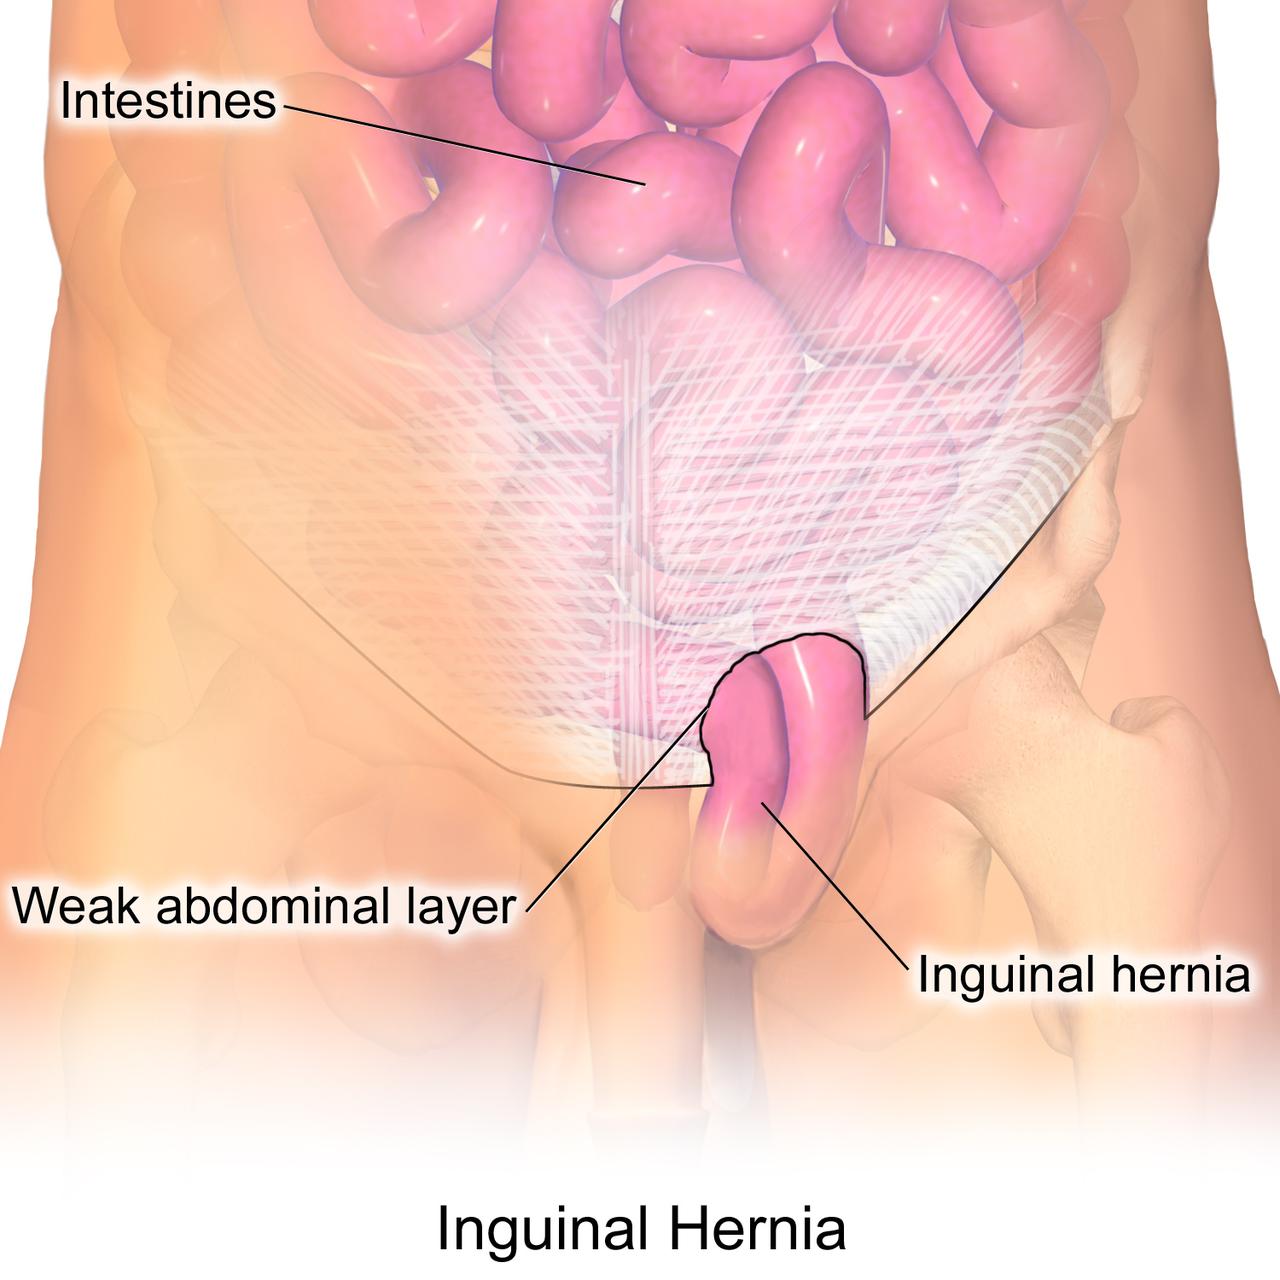 Gastrointestinal Surgery - Inguinal Hernia